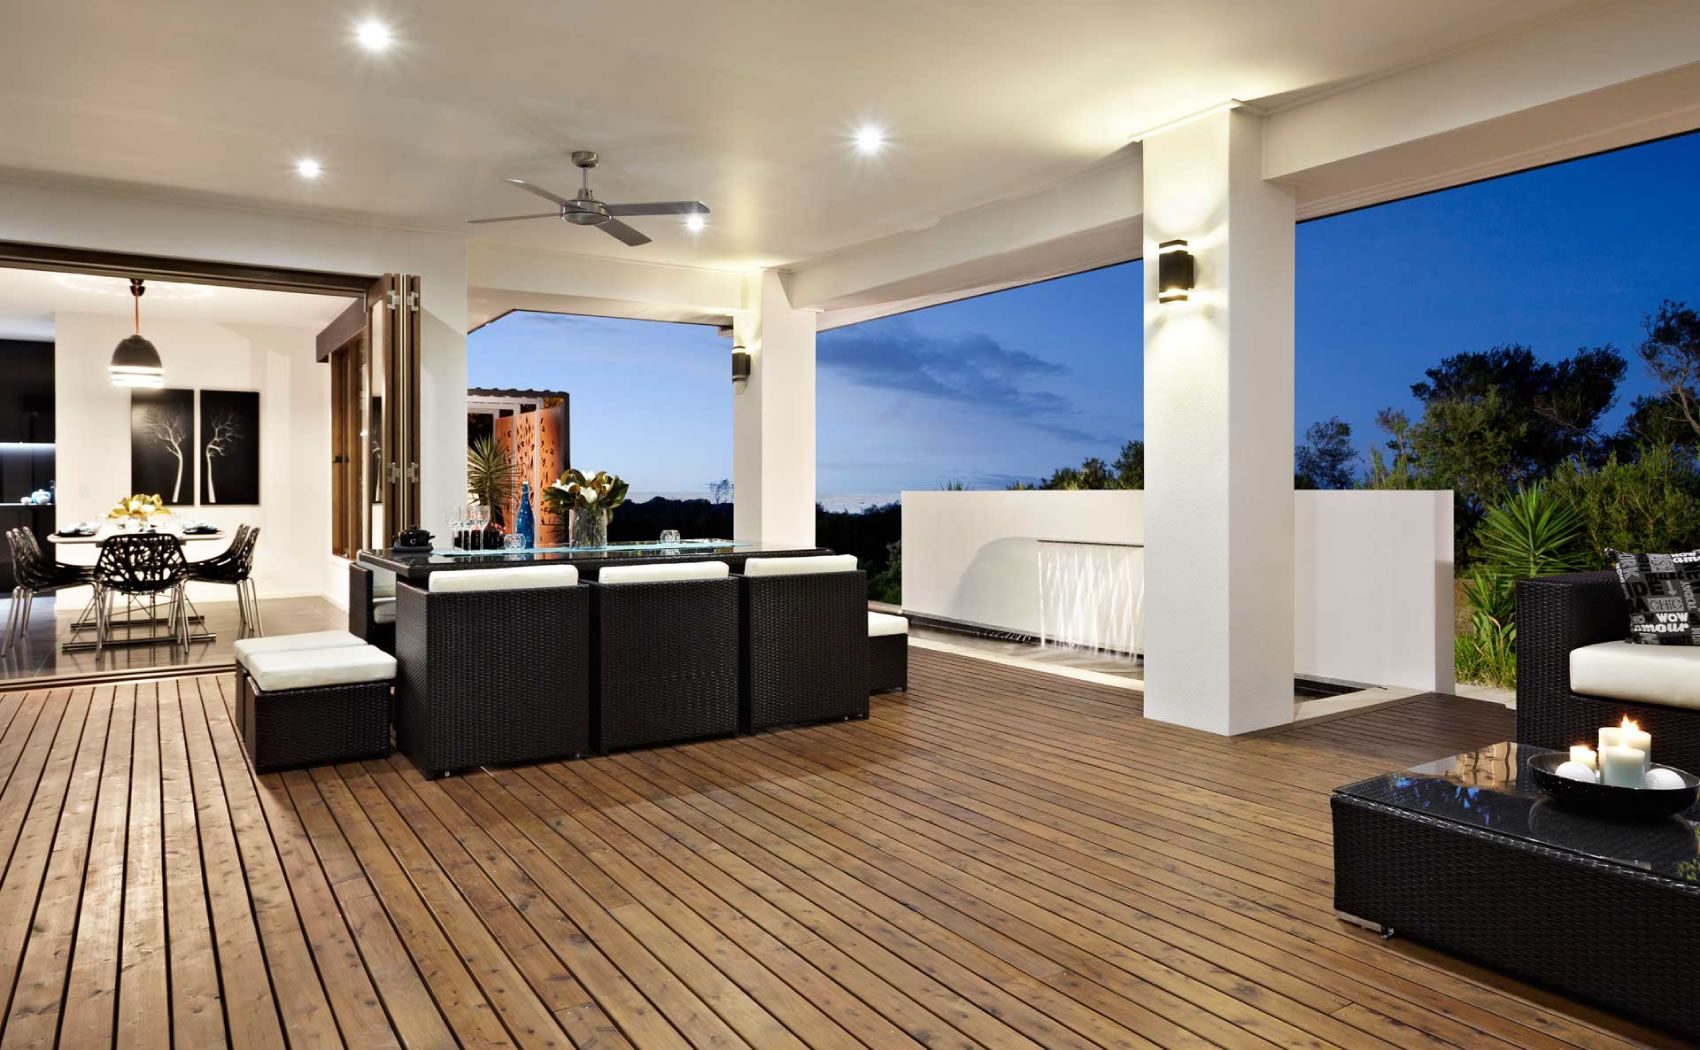 J G King Home Designs Part - 32: JG King Homes - Select Your Region